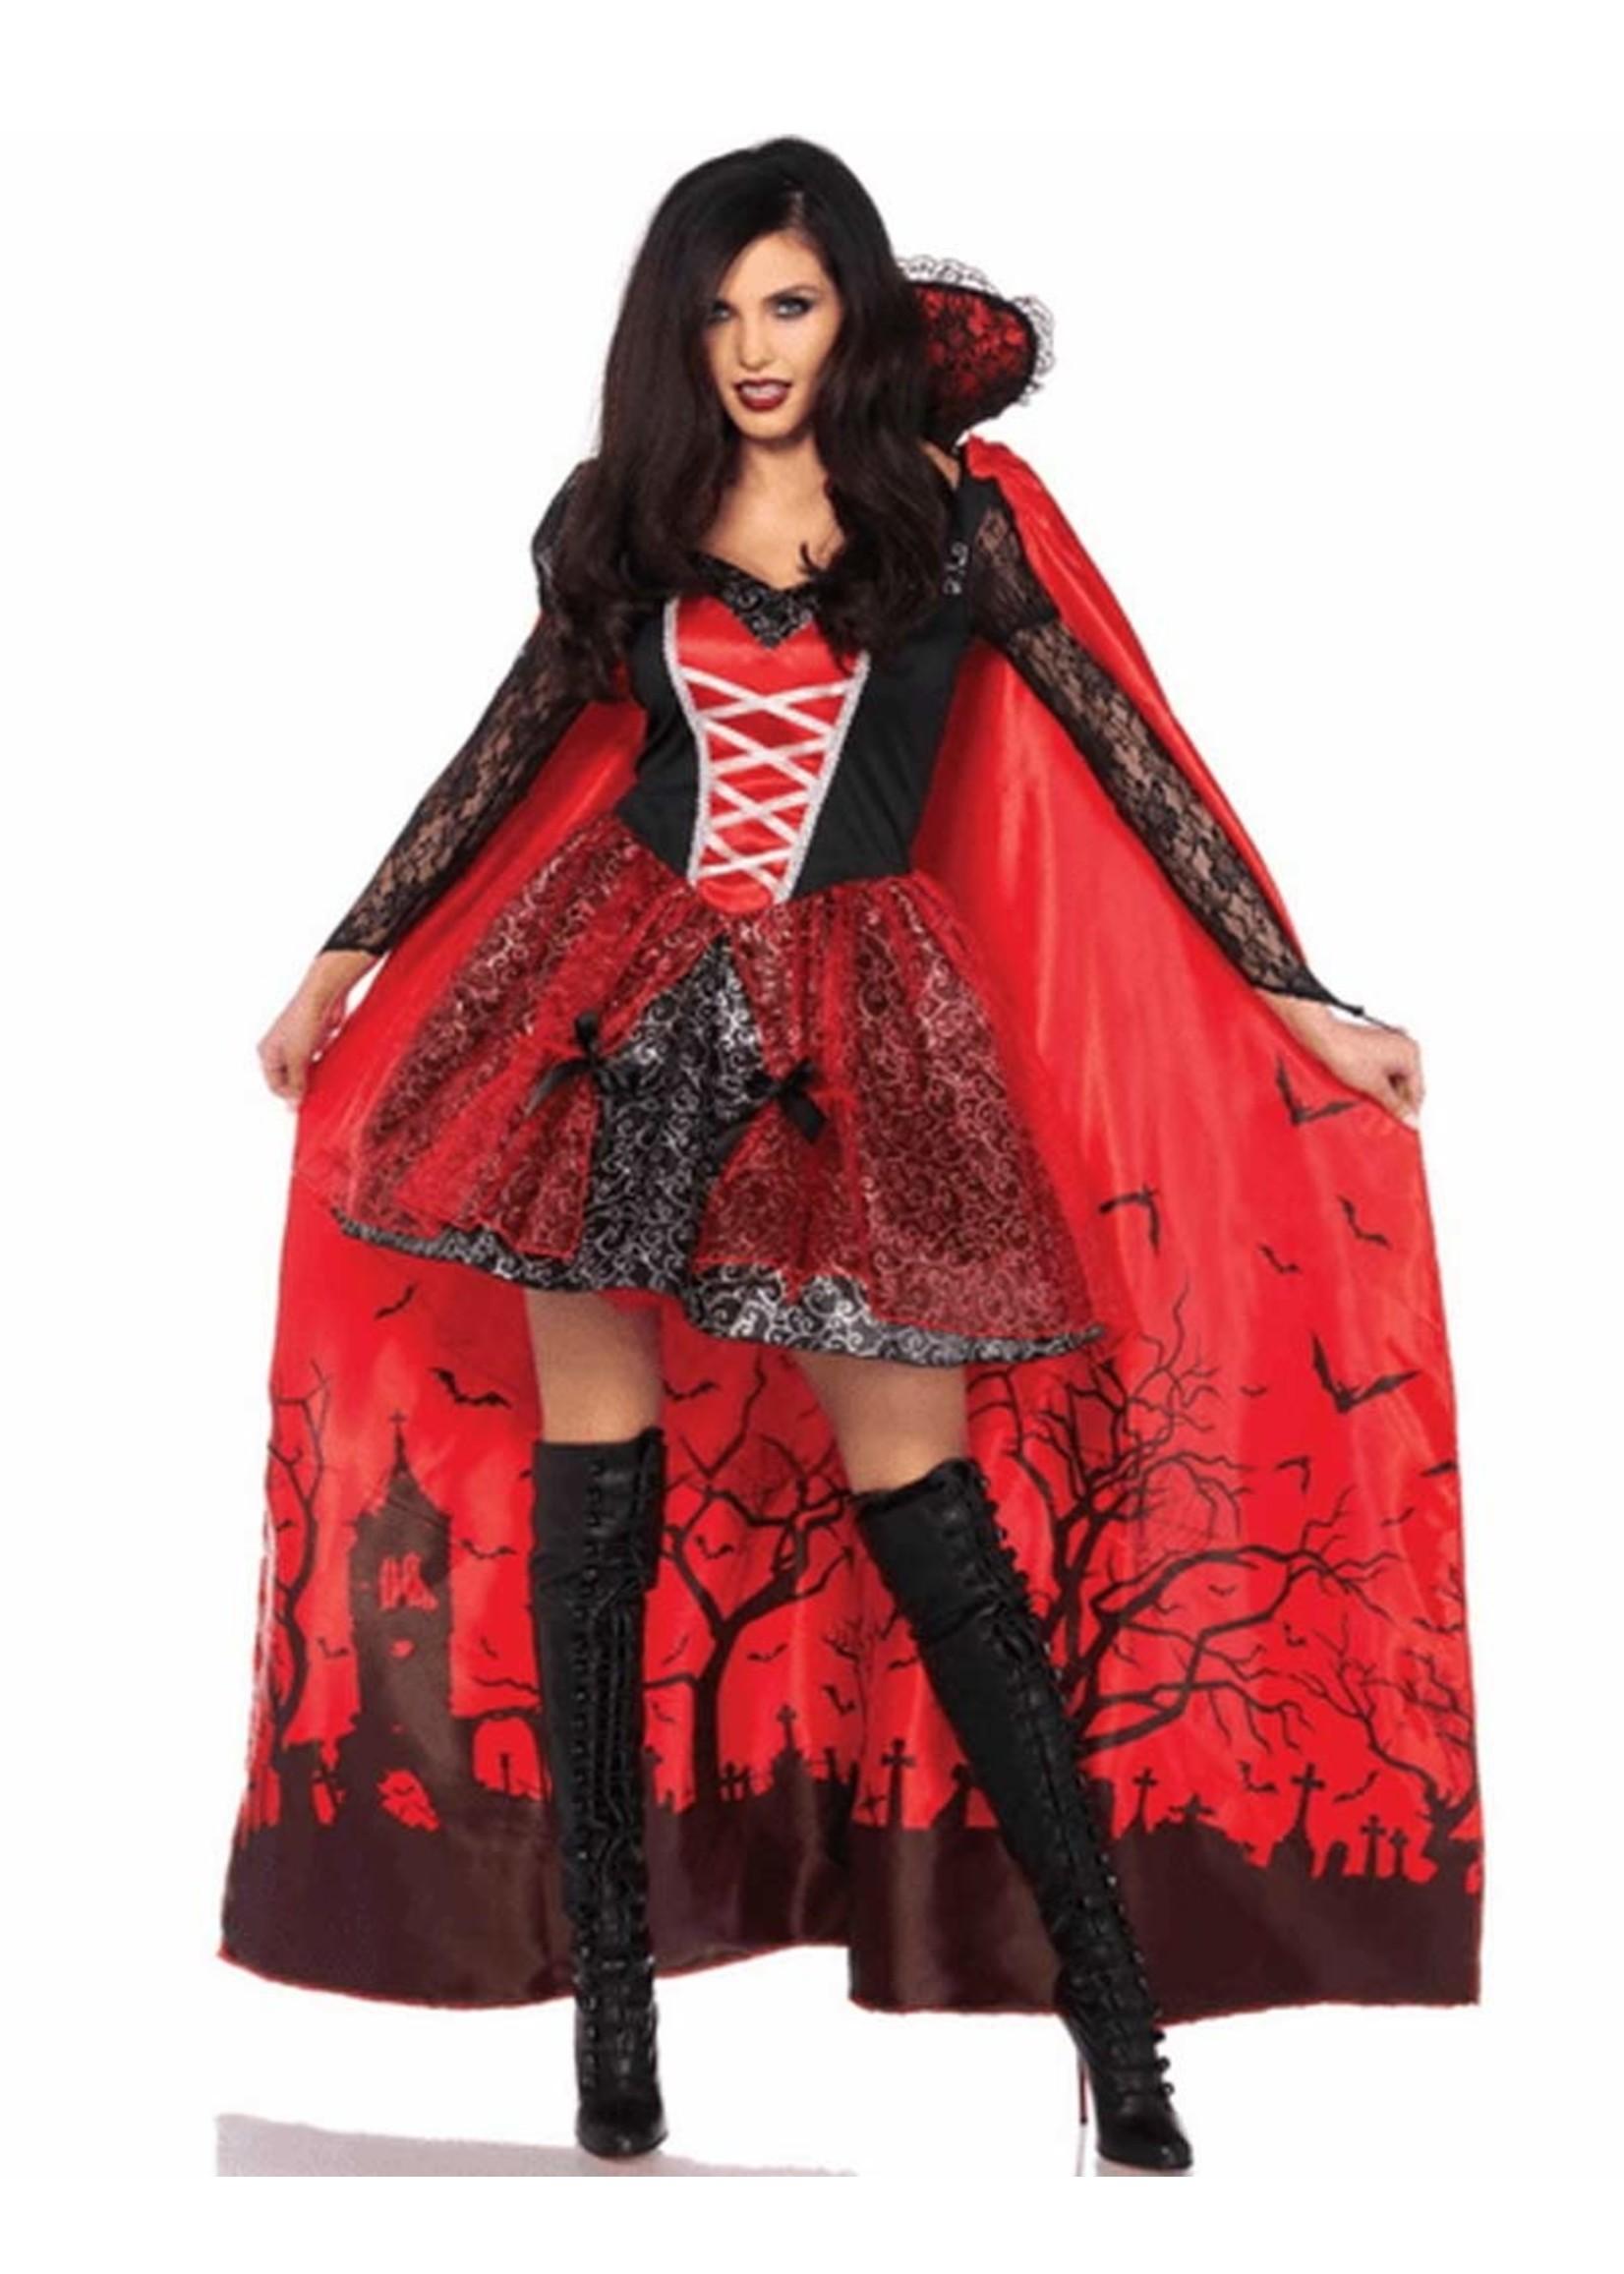 Vampire Temptress - Women's